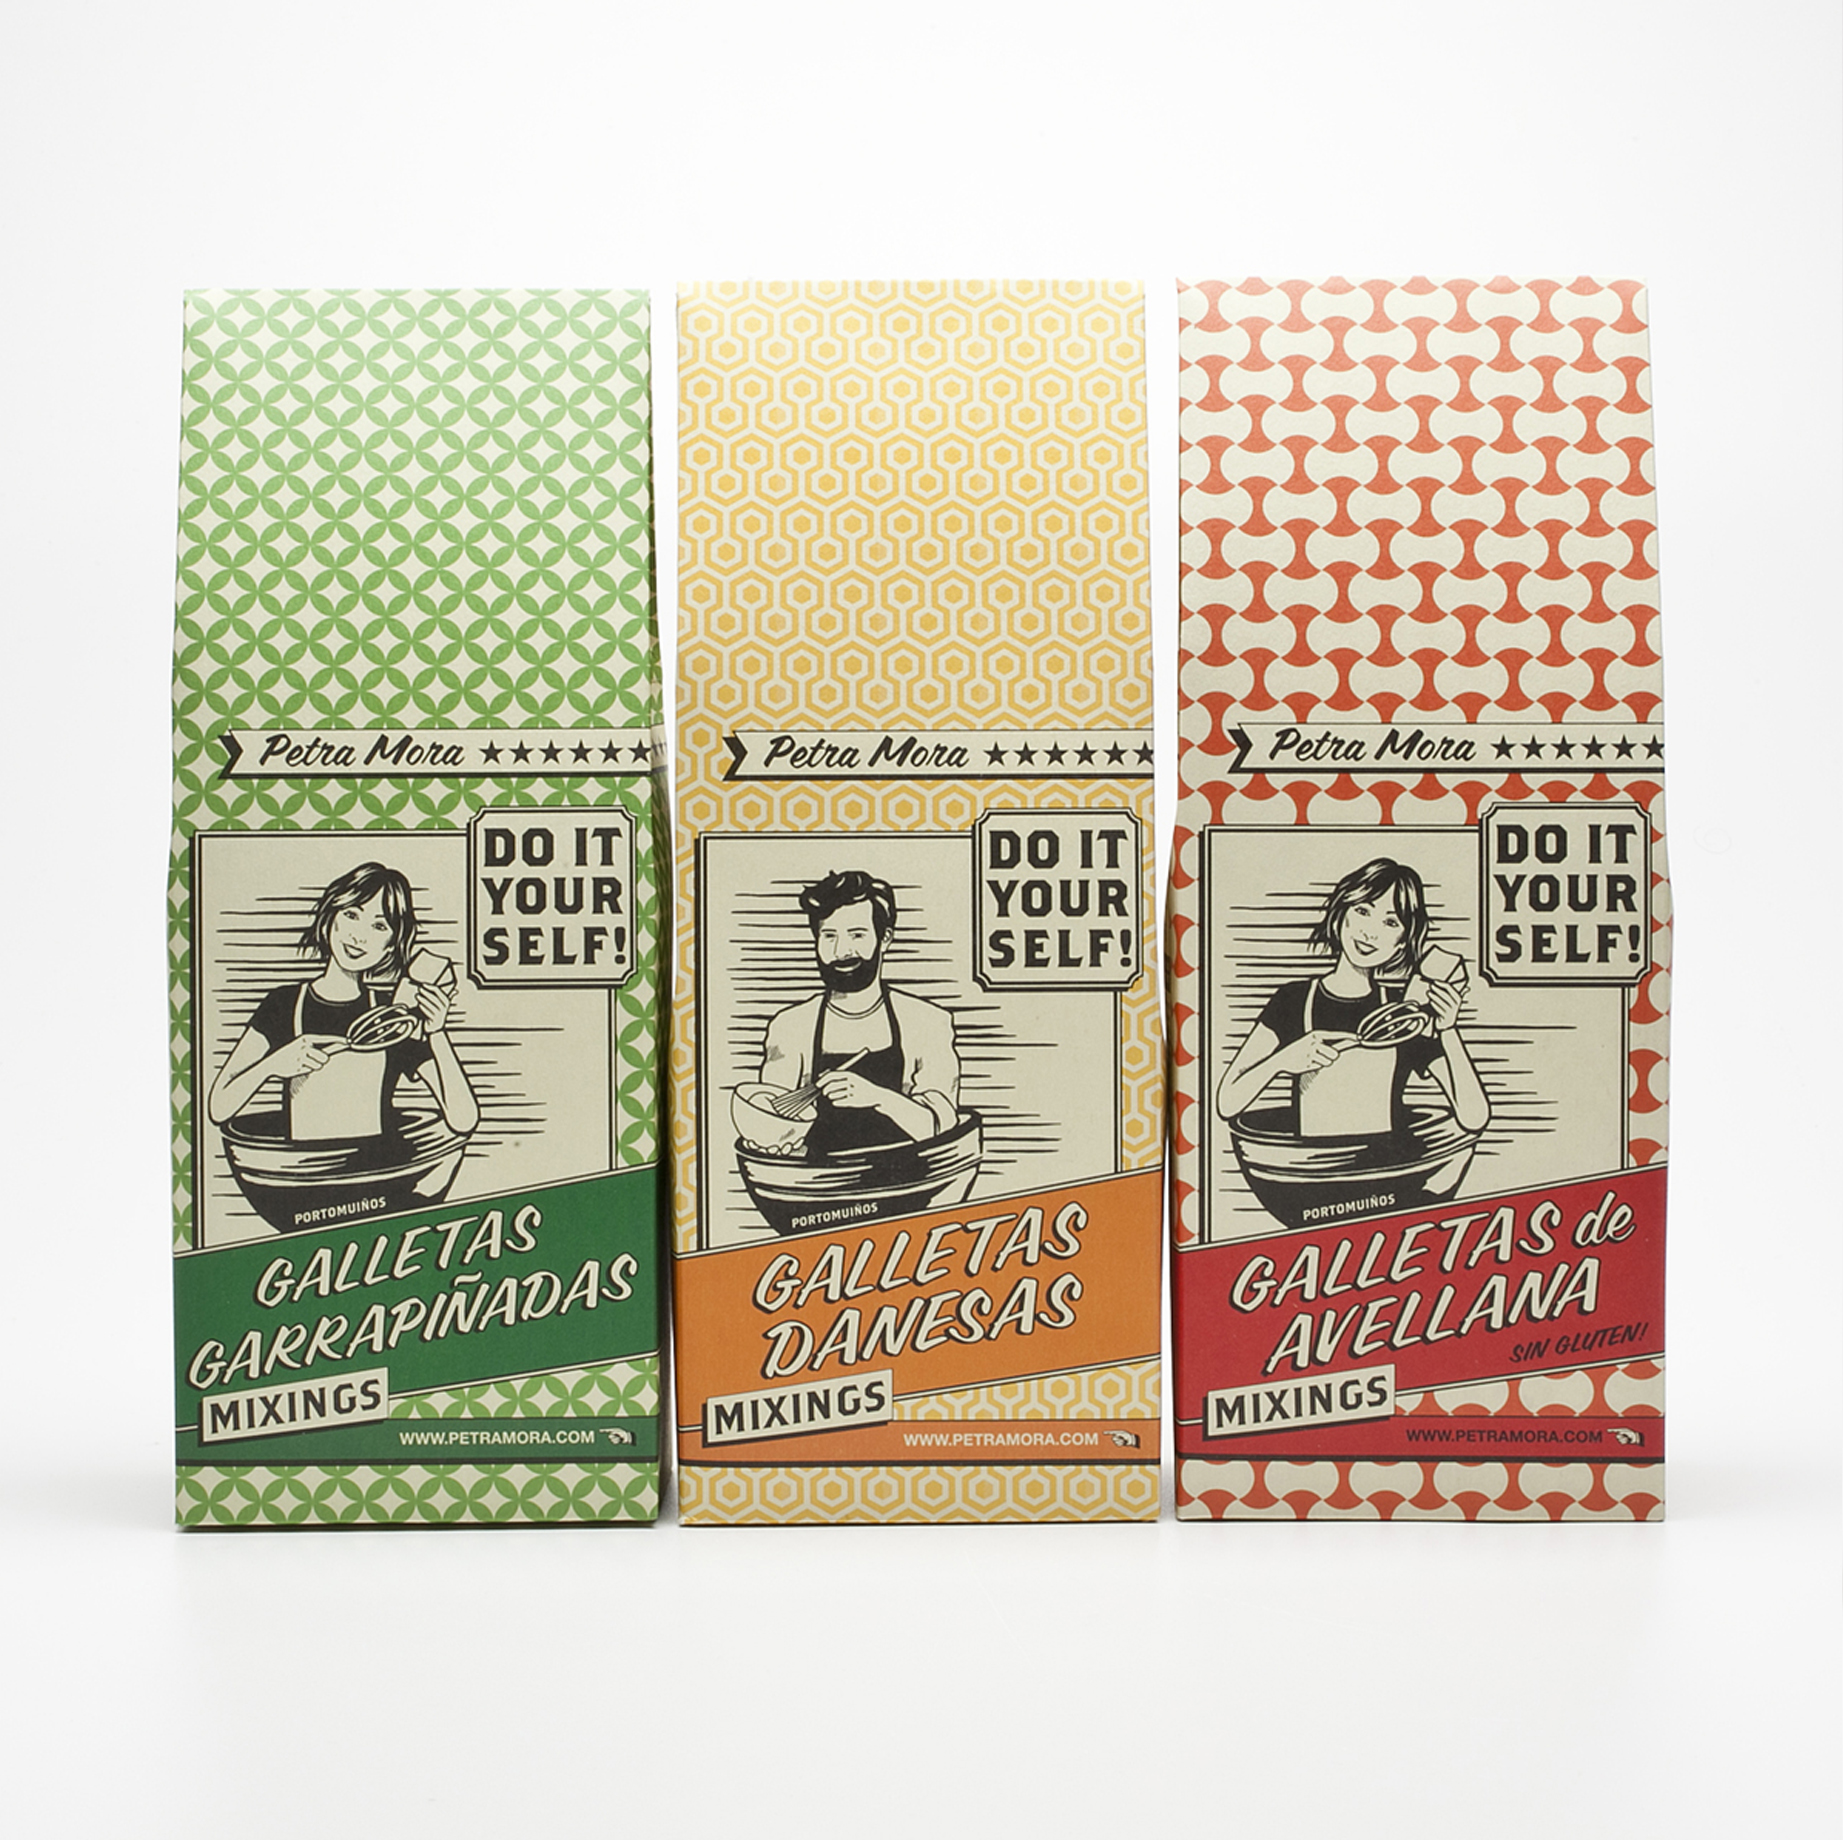 thedieline packagingoftheworld diseno packaging illustration theaoi theoneclubforcreativity